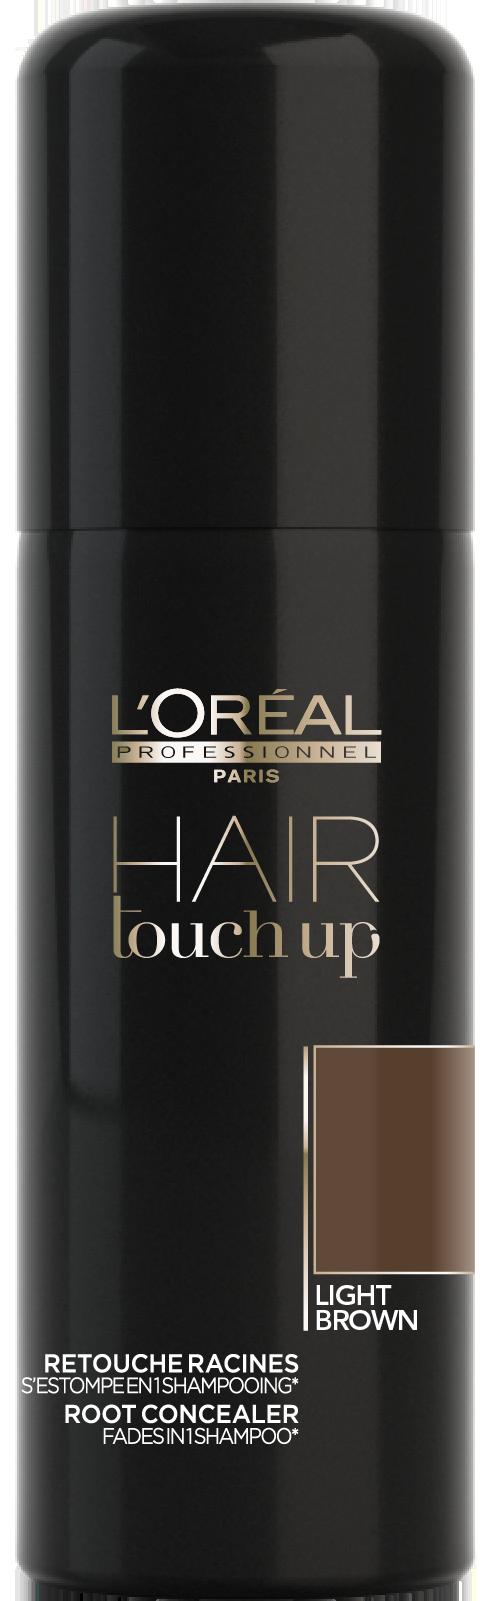 Hair Touch Up Jasny Brąz